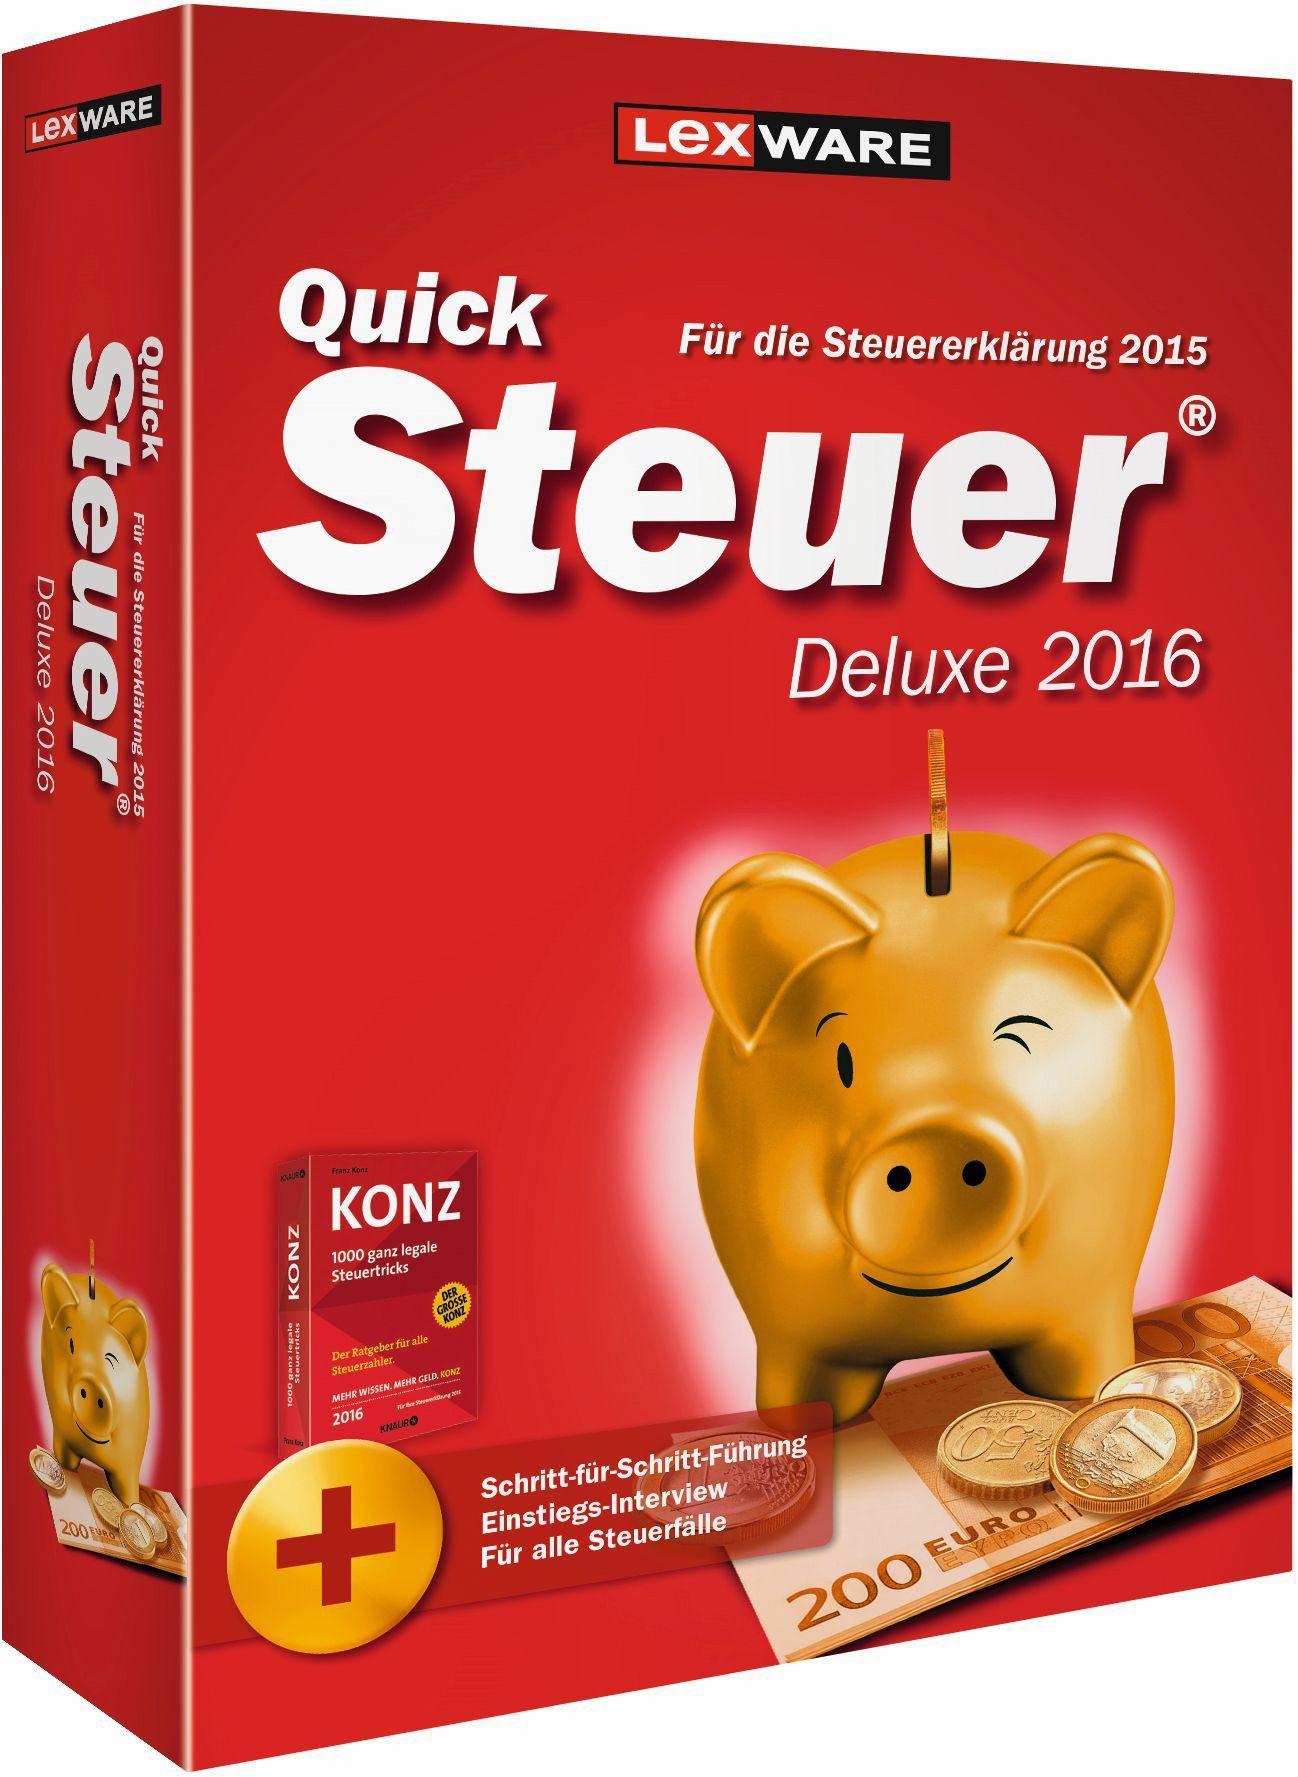 Lexware Finanzen/Steuer »Quicksteuer Deluxe 2016«